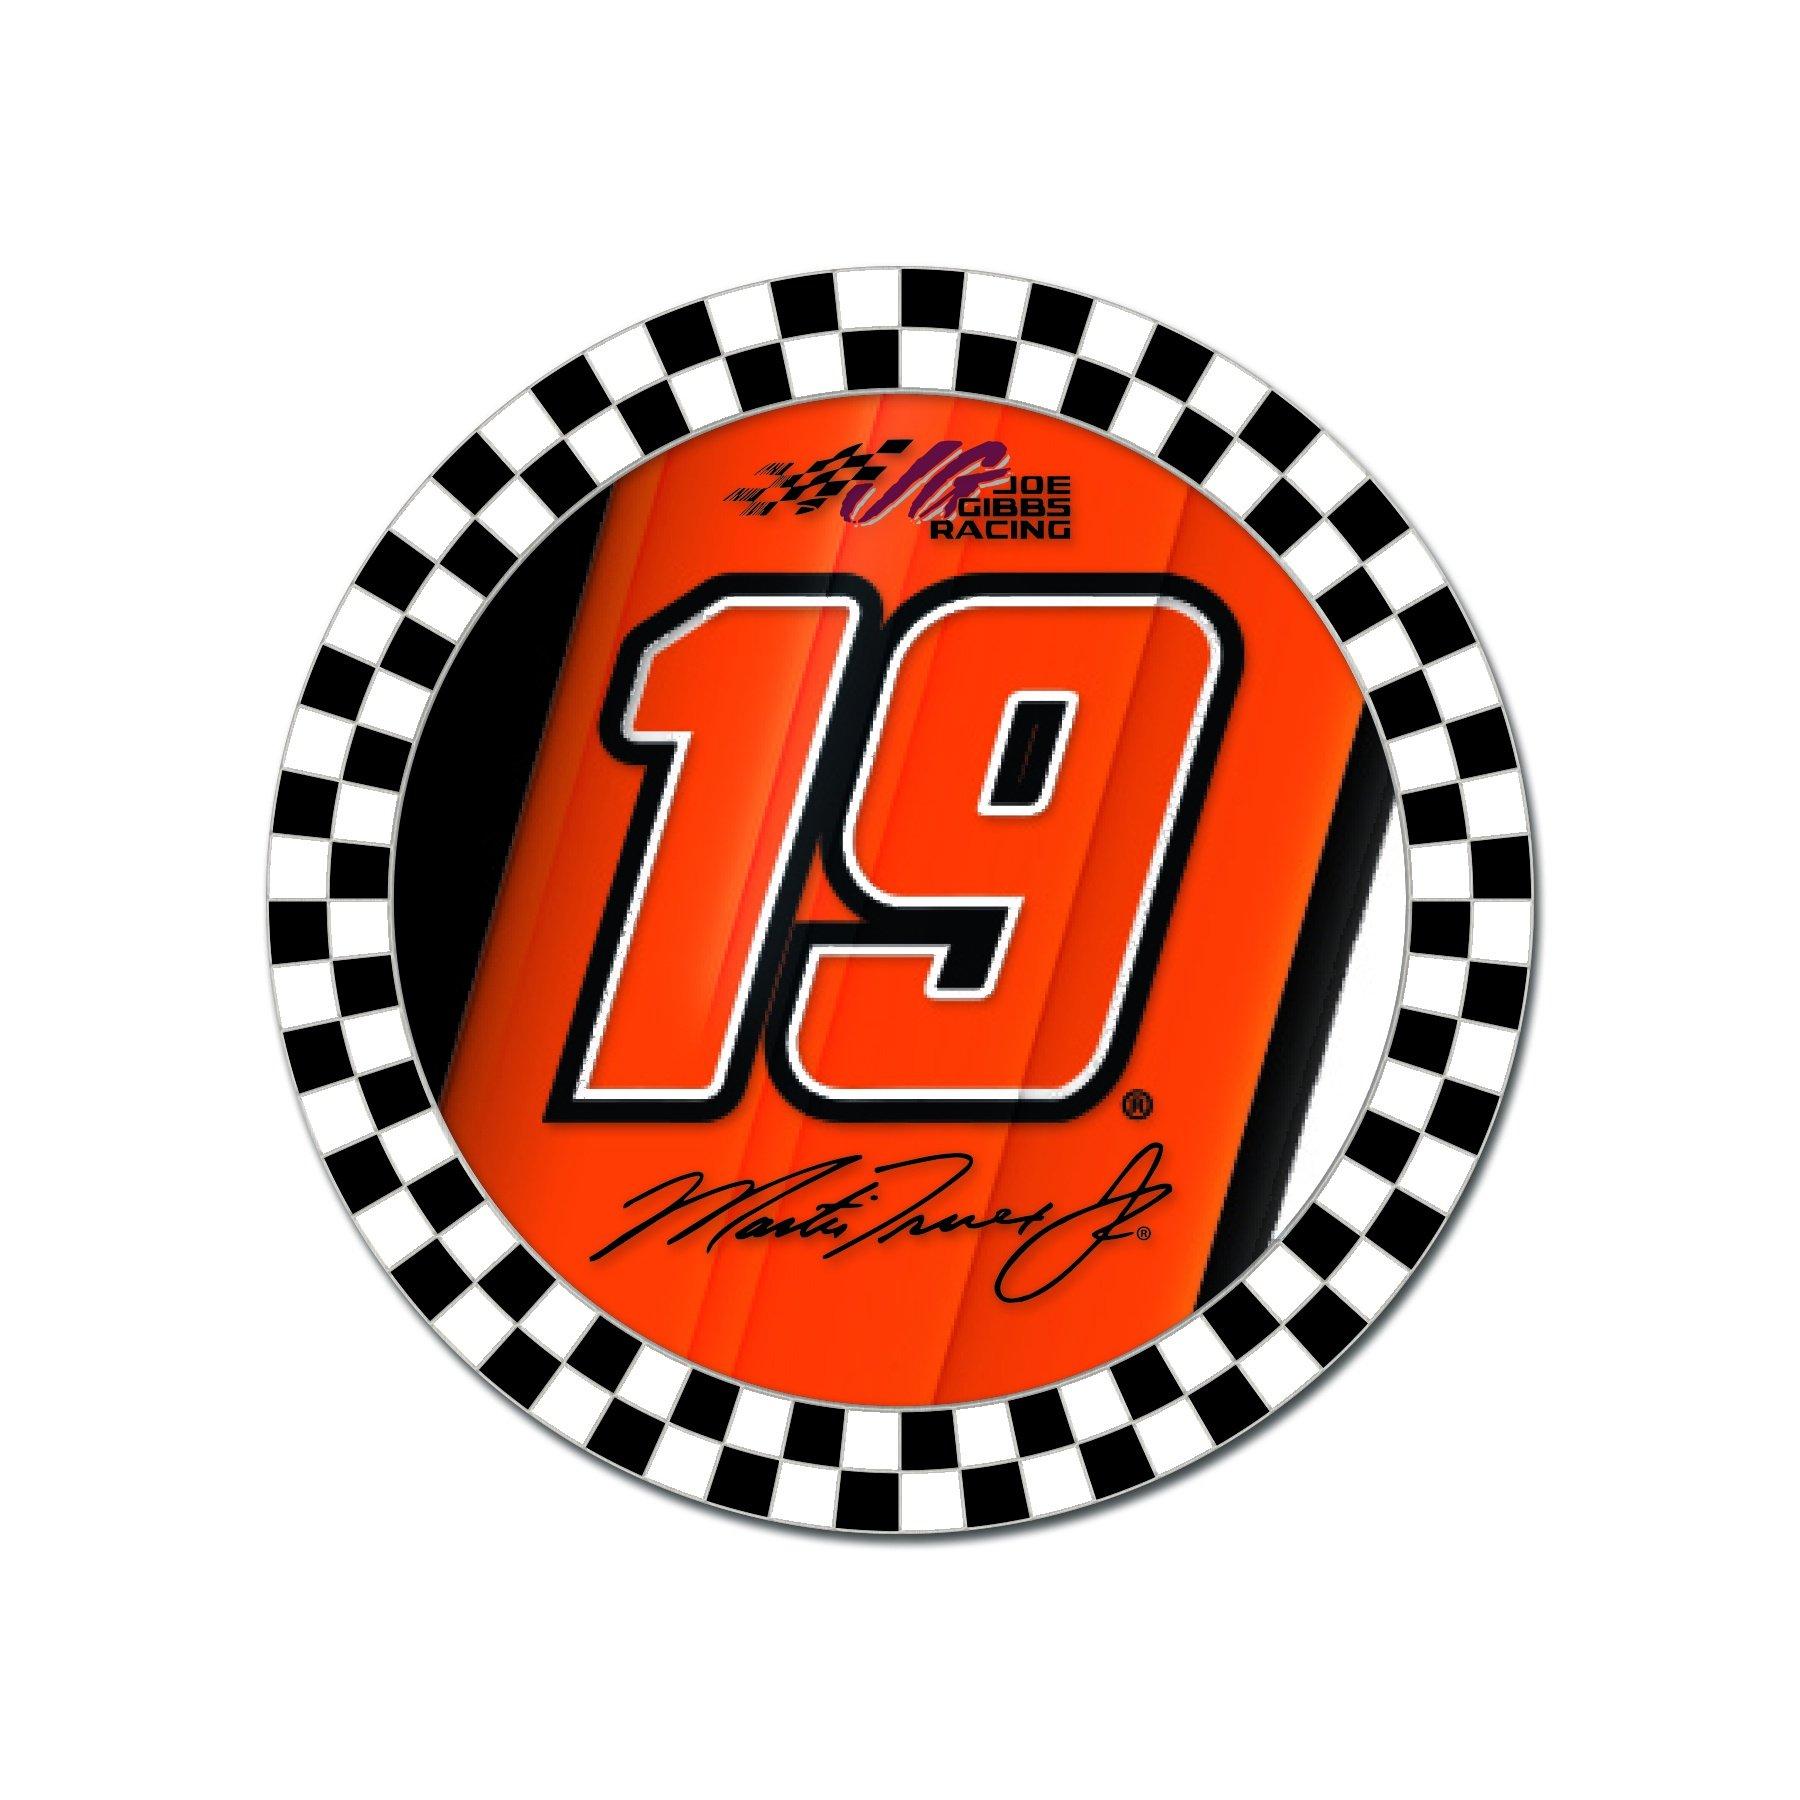 Martin Truex Jr. Round 19 Collector Pin.